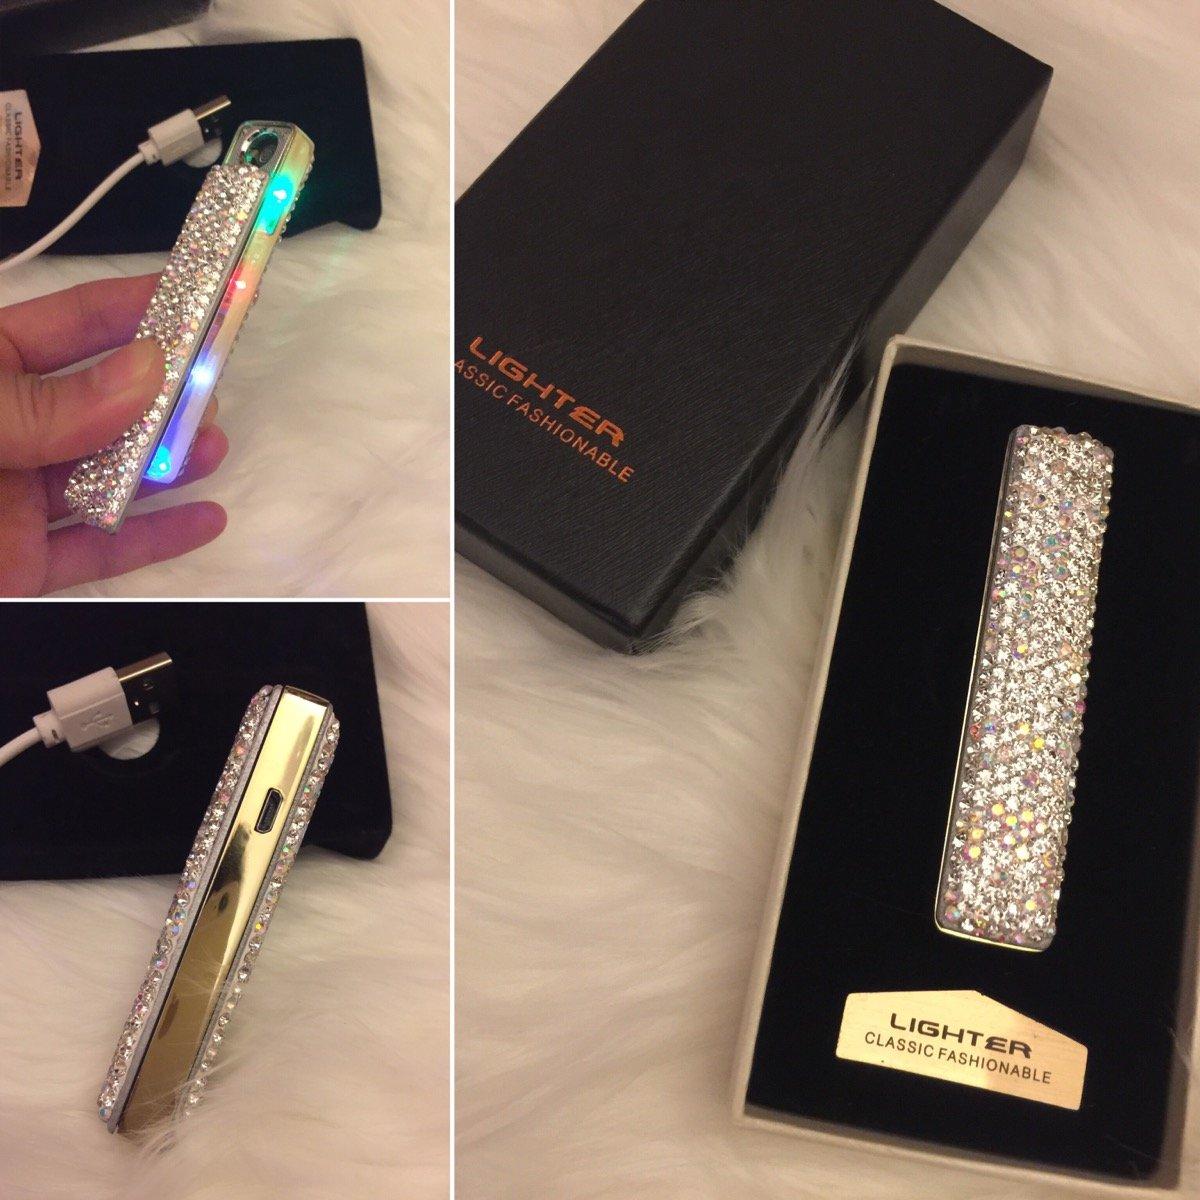 TISHAA Super Bling Rhinestone Slim Mini Slide USB LED Rechargeable Windproof Cigarette Lighter, Flameless, w Charging Cable